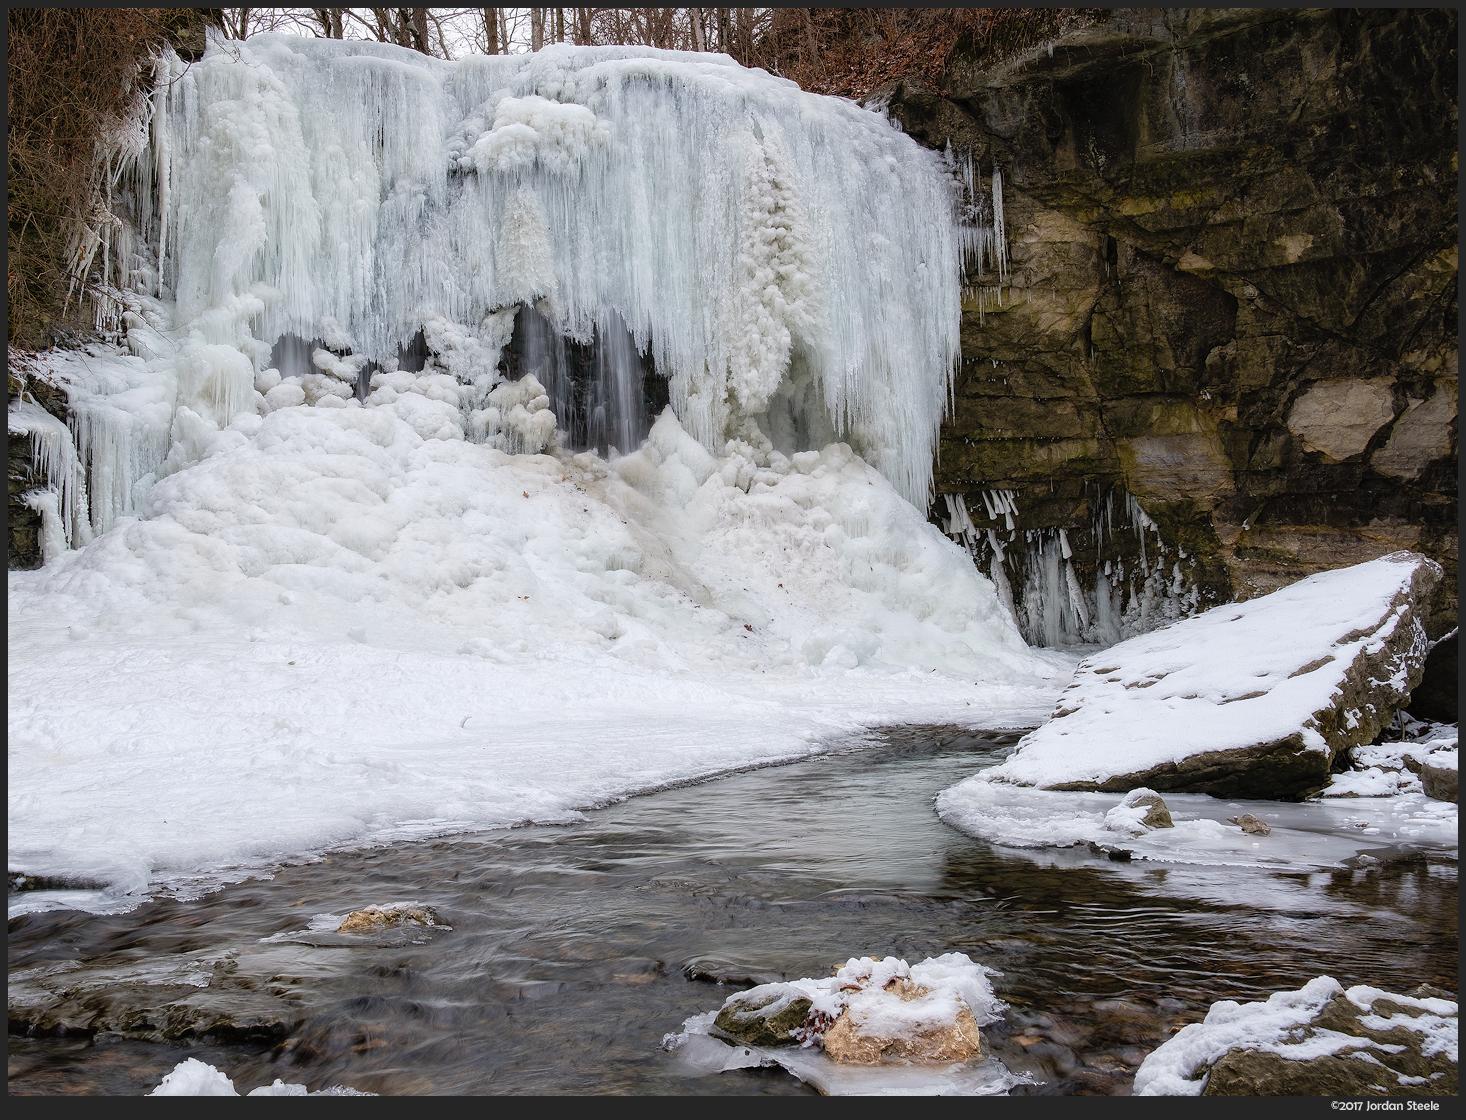 Frozen Falls - Fujifilm X-T2 with Fujinon XF 23mm f/2 R WR @ f/8